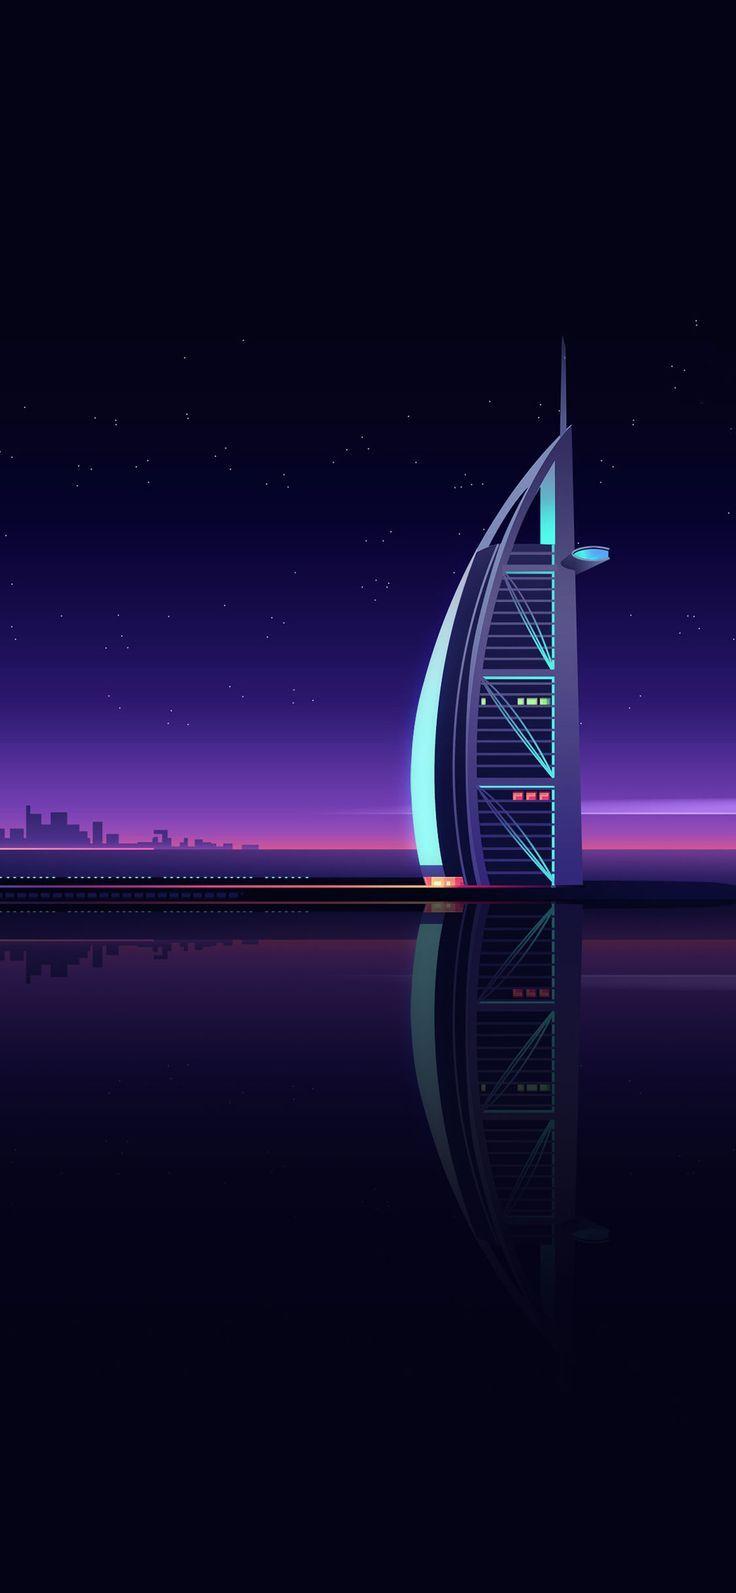 Burj Al Arab Iphone Xs Wallpaper 1 Jpg 1 125 2 436 Pixel Minimalistische Wallpaper Hd Wallpaper Android Hintergrundbild Samsung